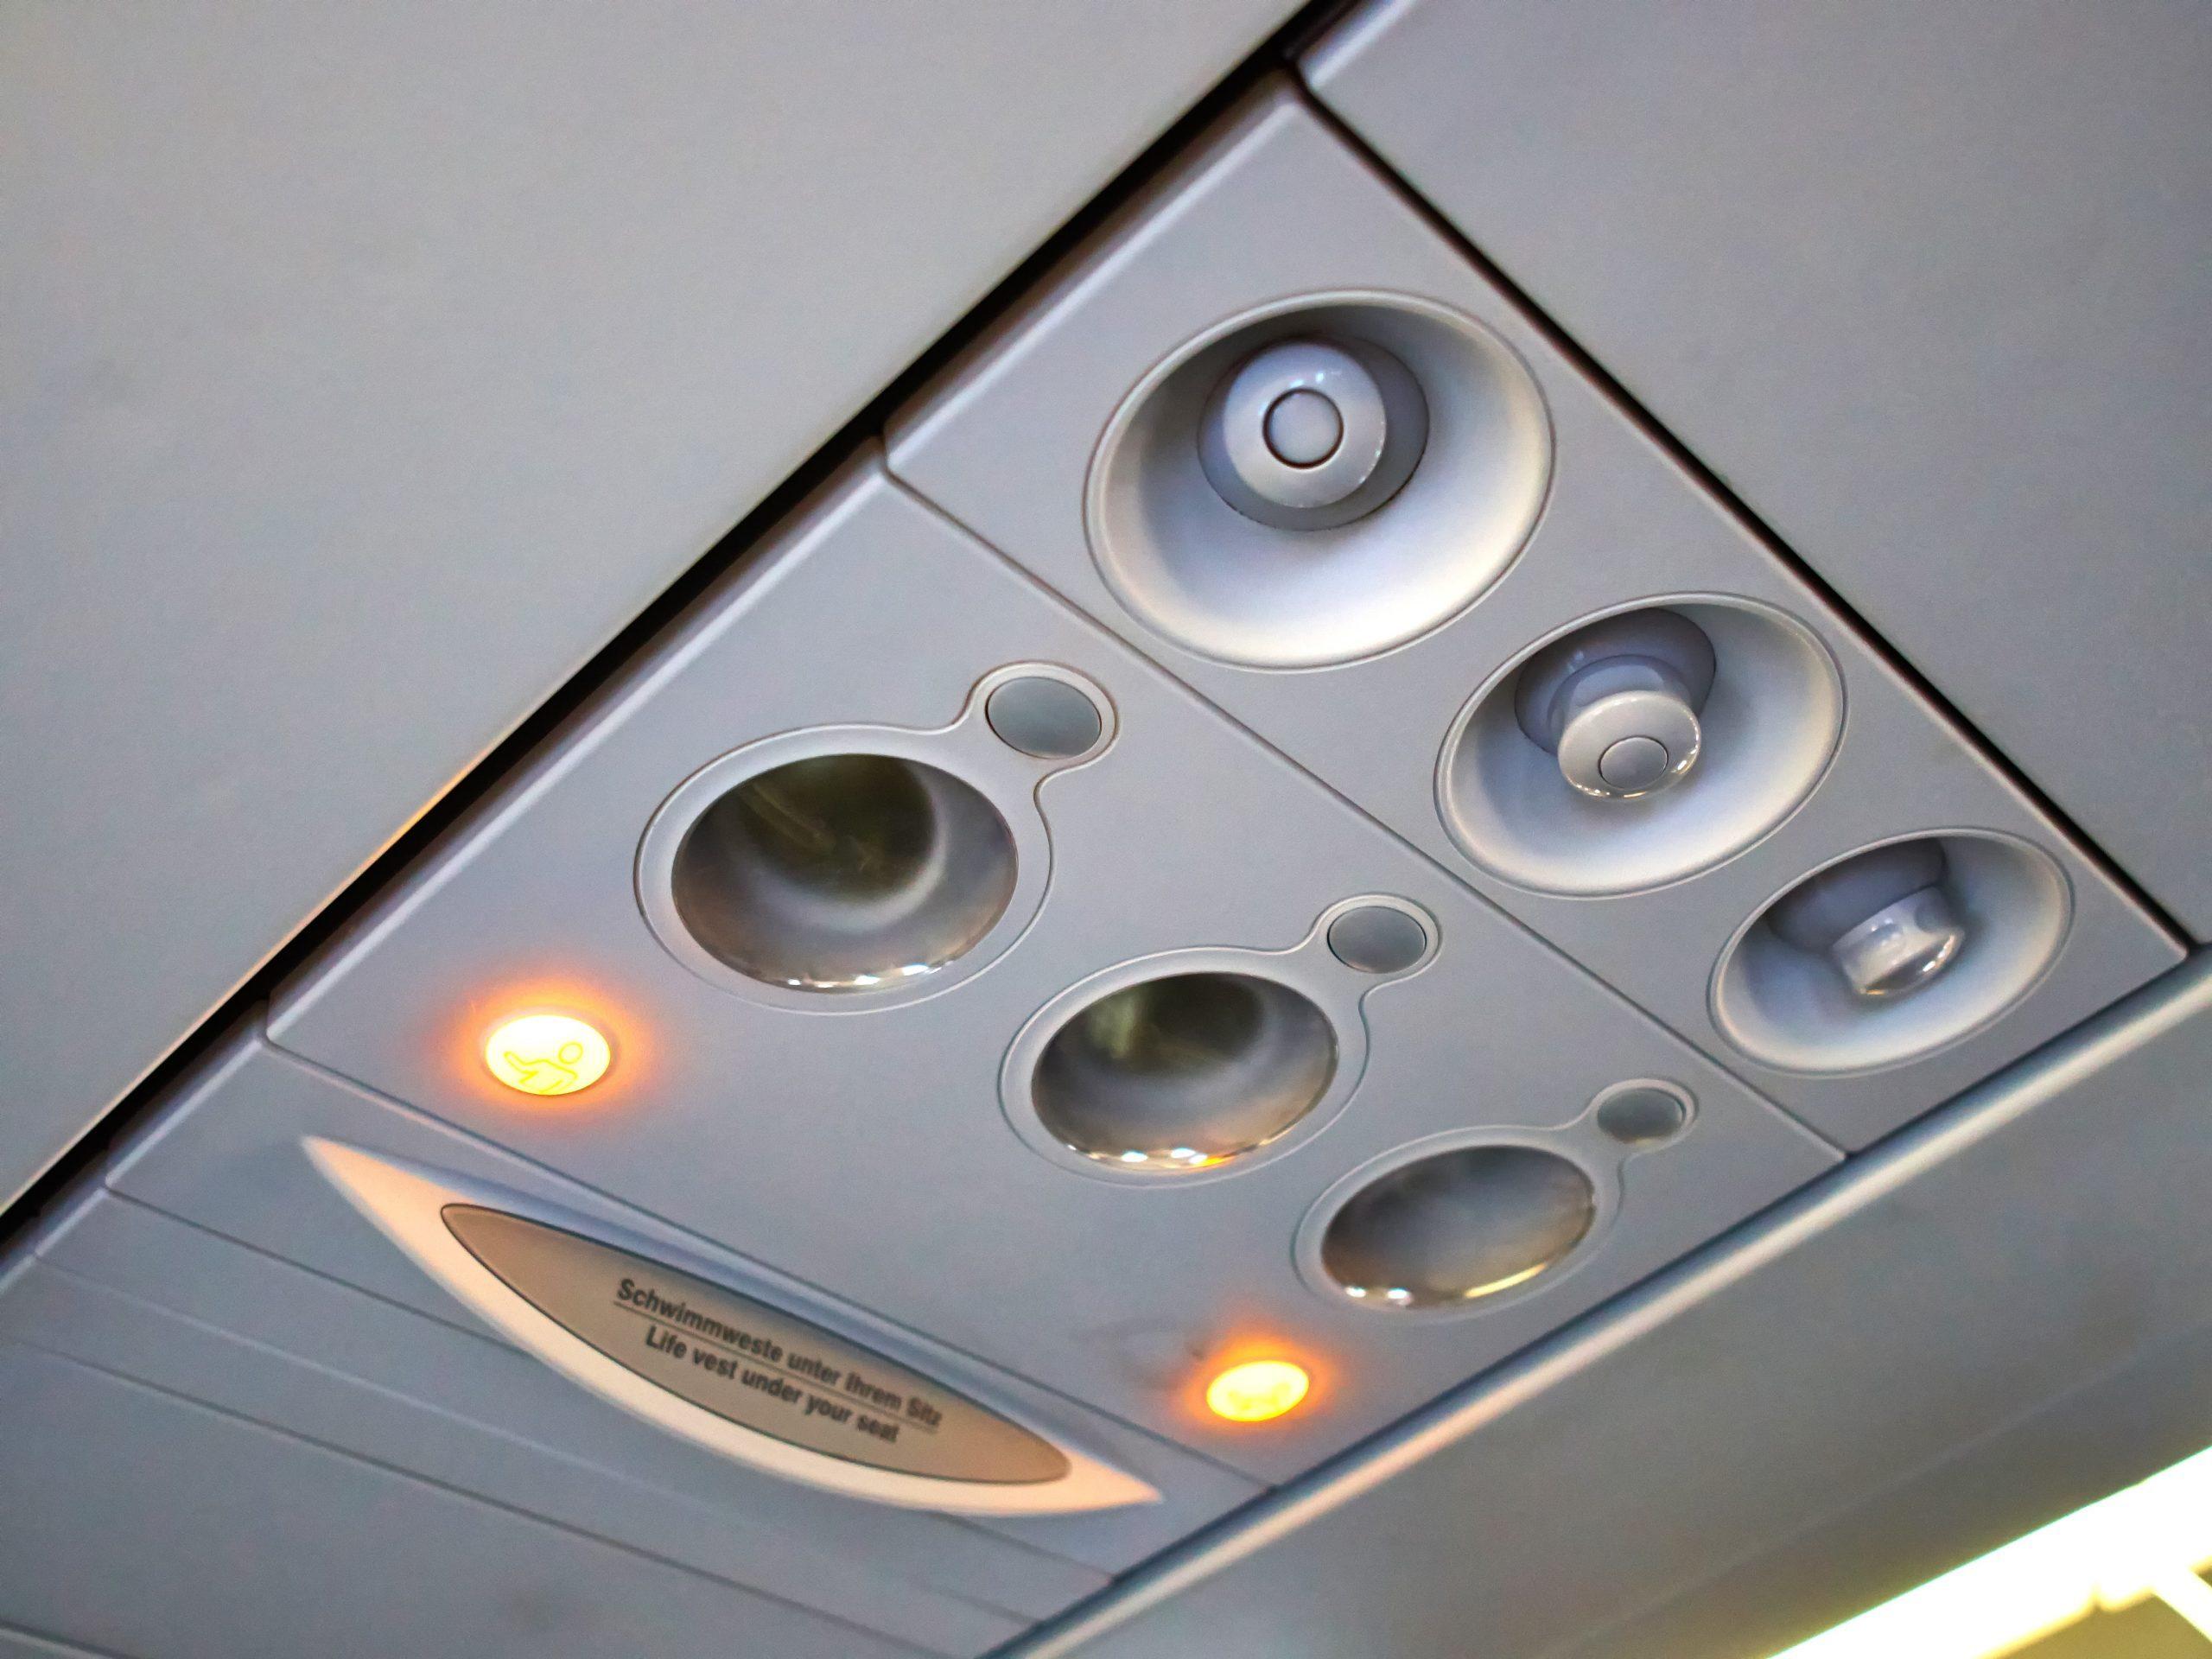 Passenger plane cabin overhead panelwith lights turned on